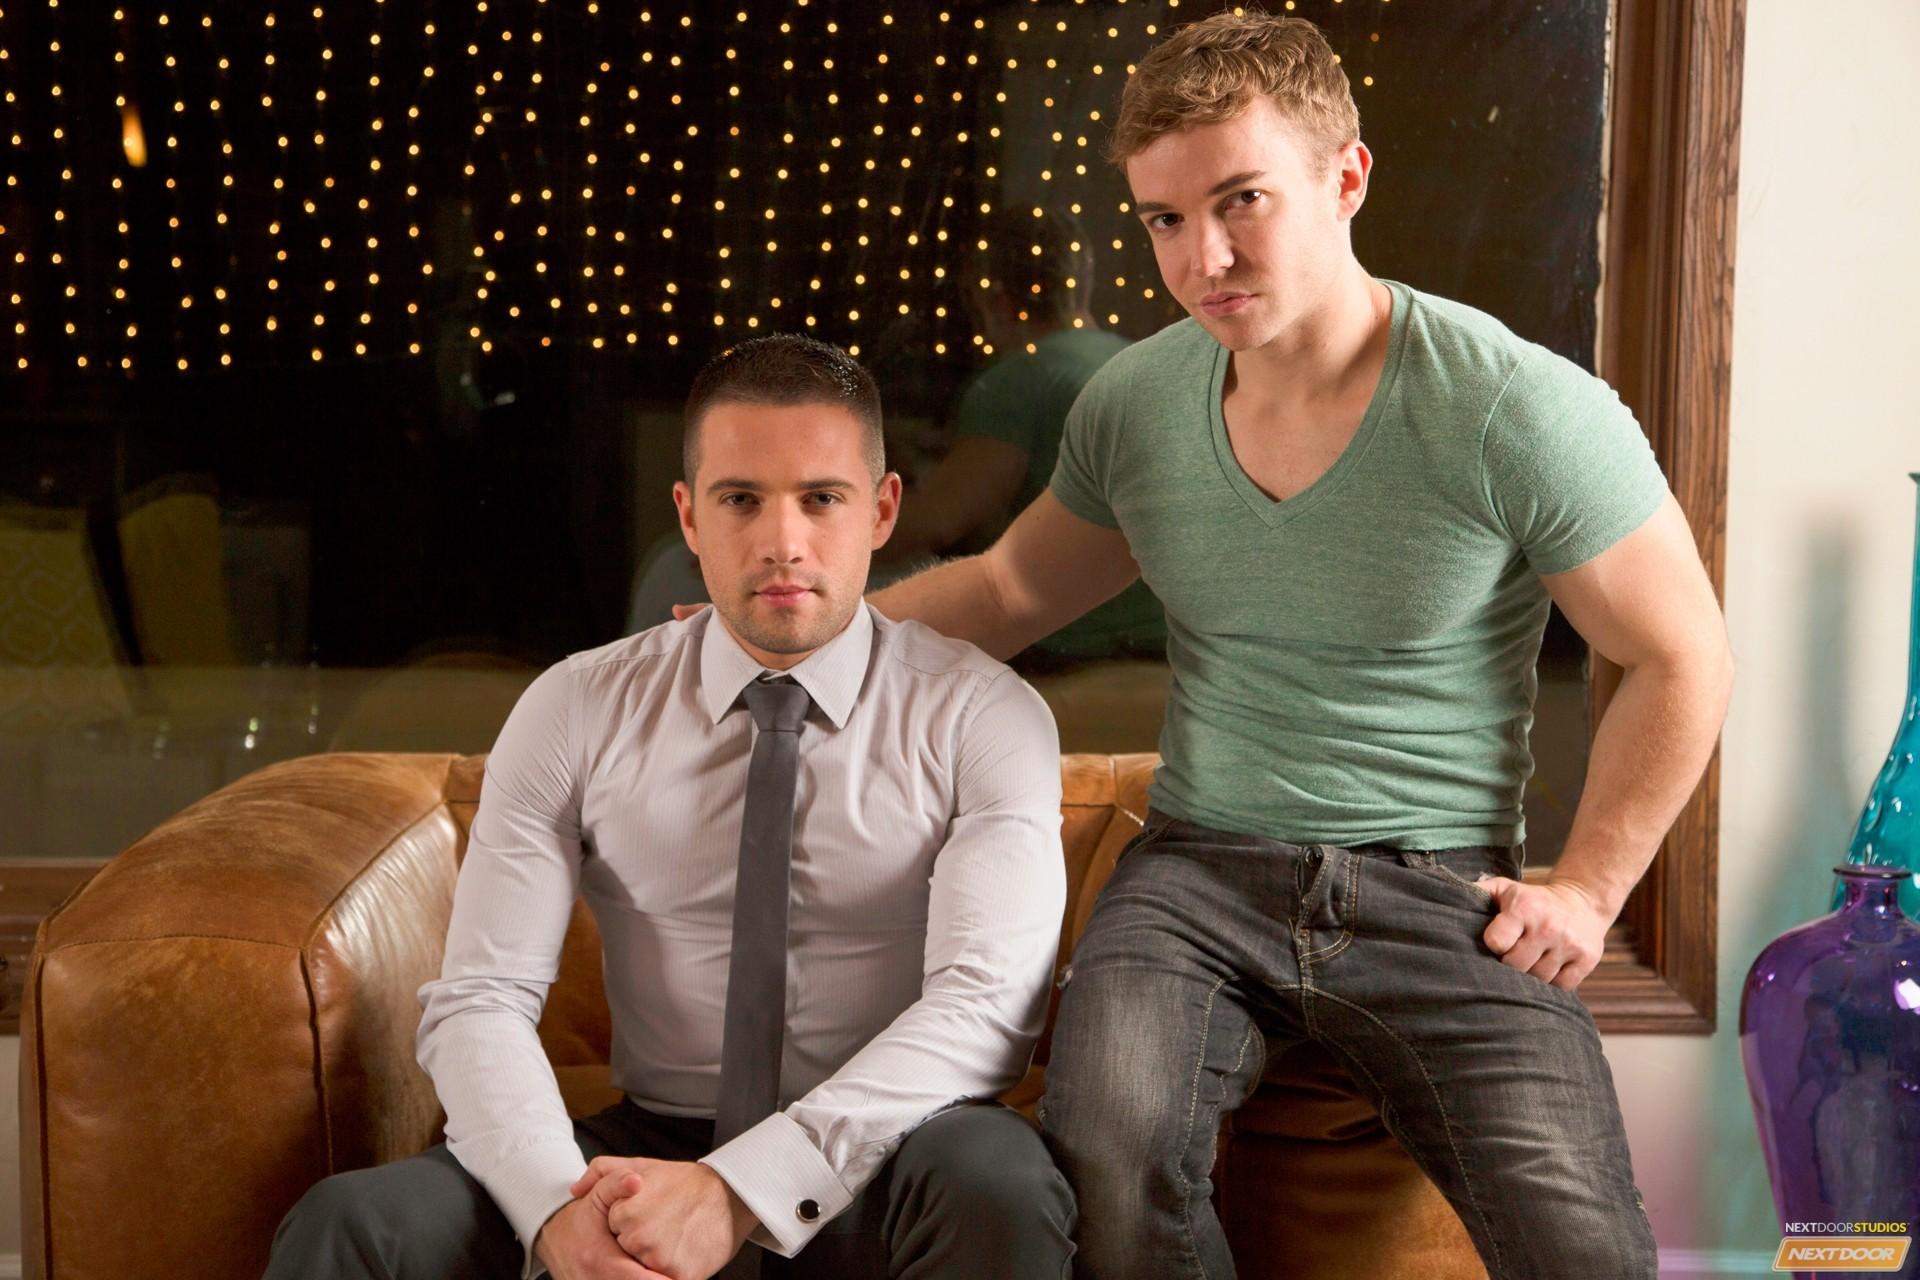 Do boys like really skinny blokes?